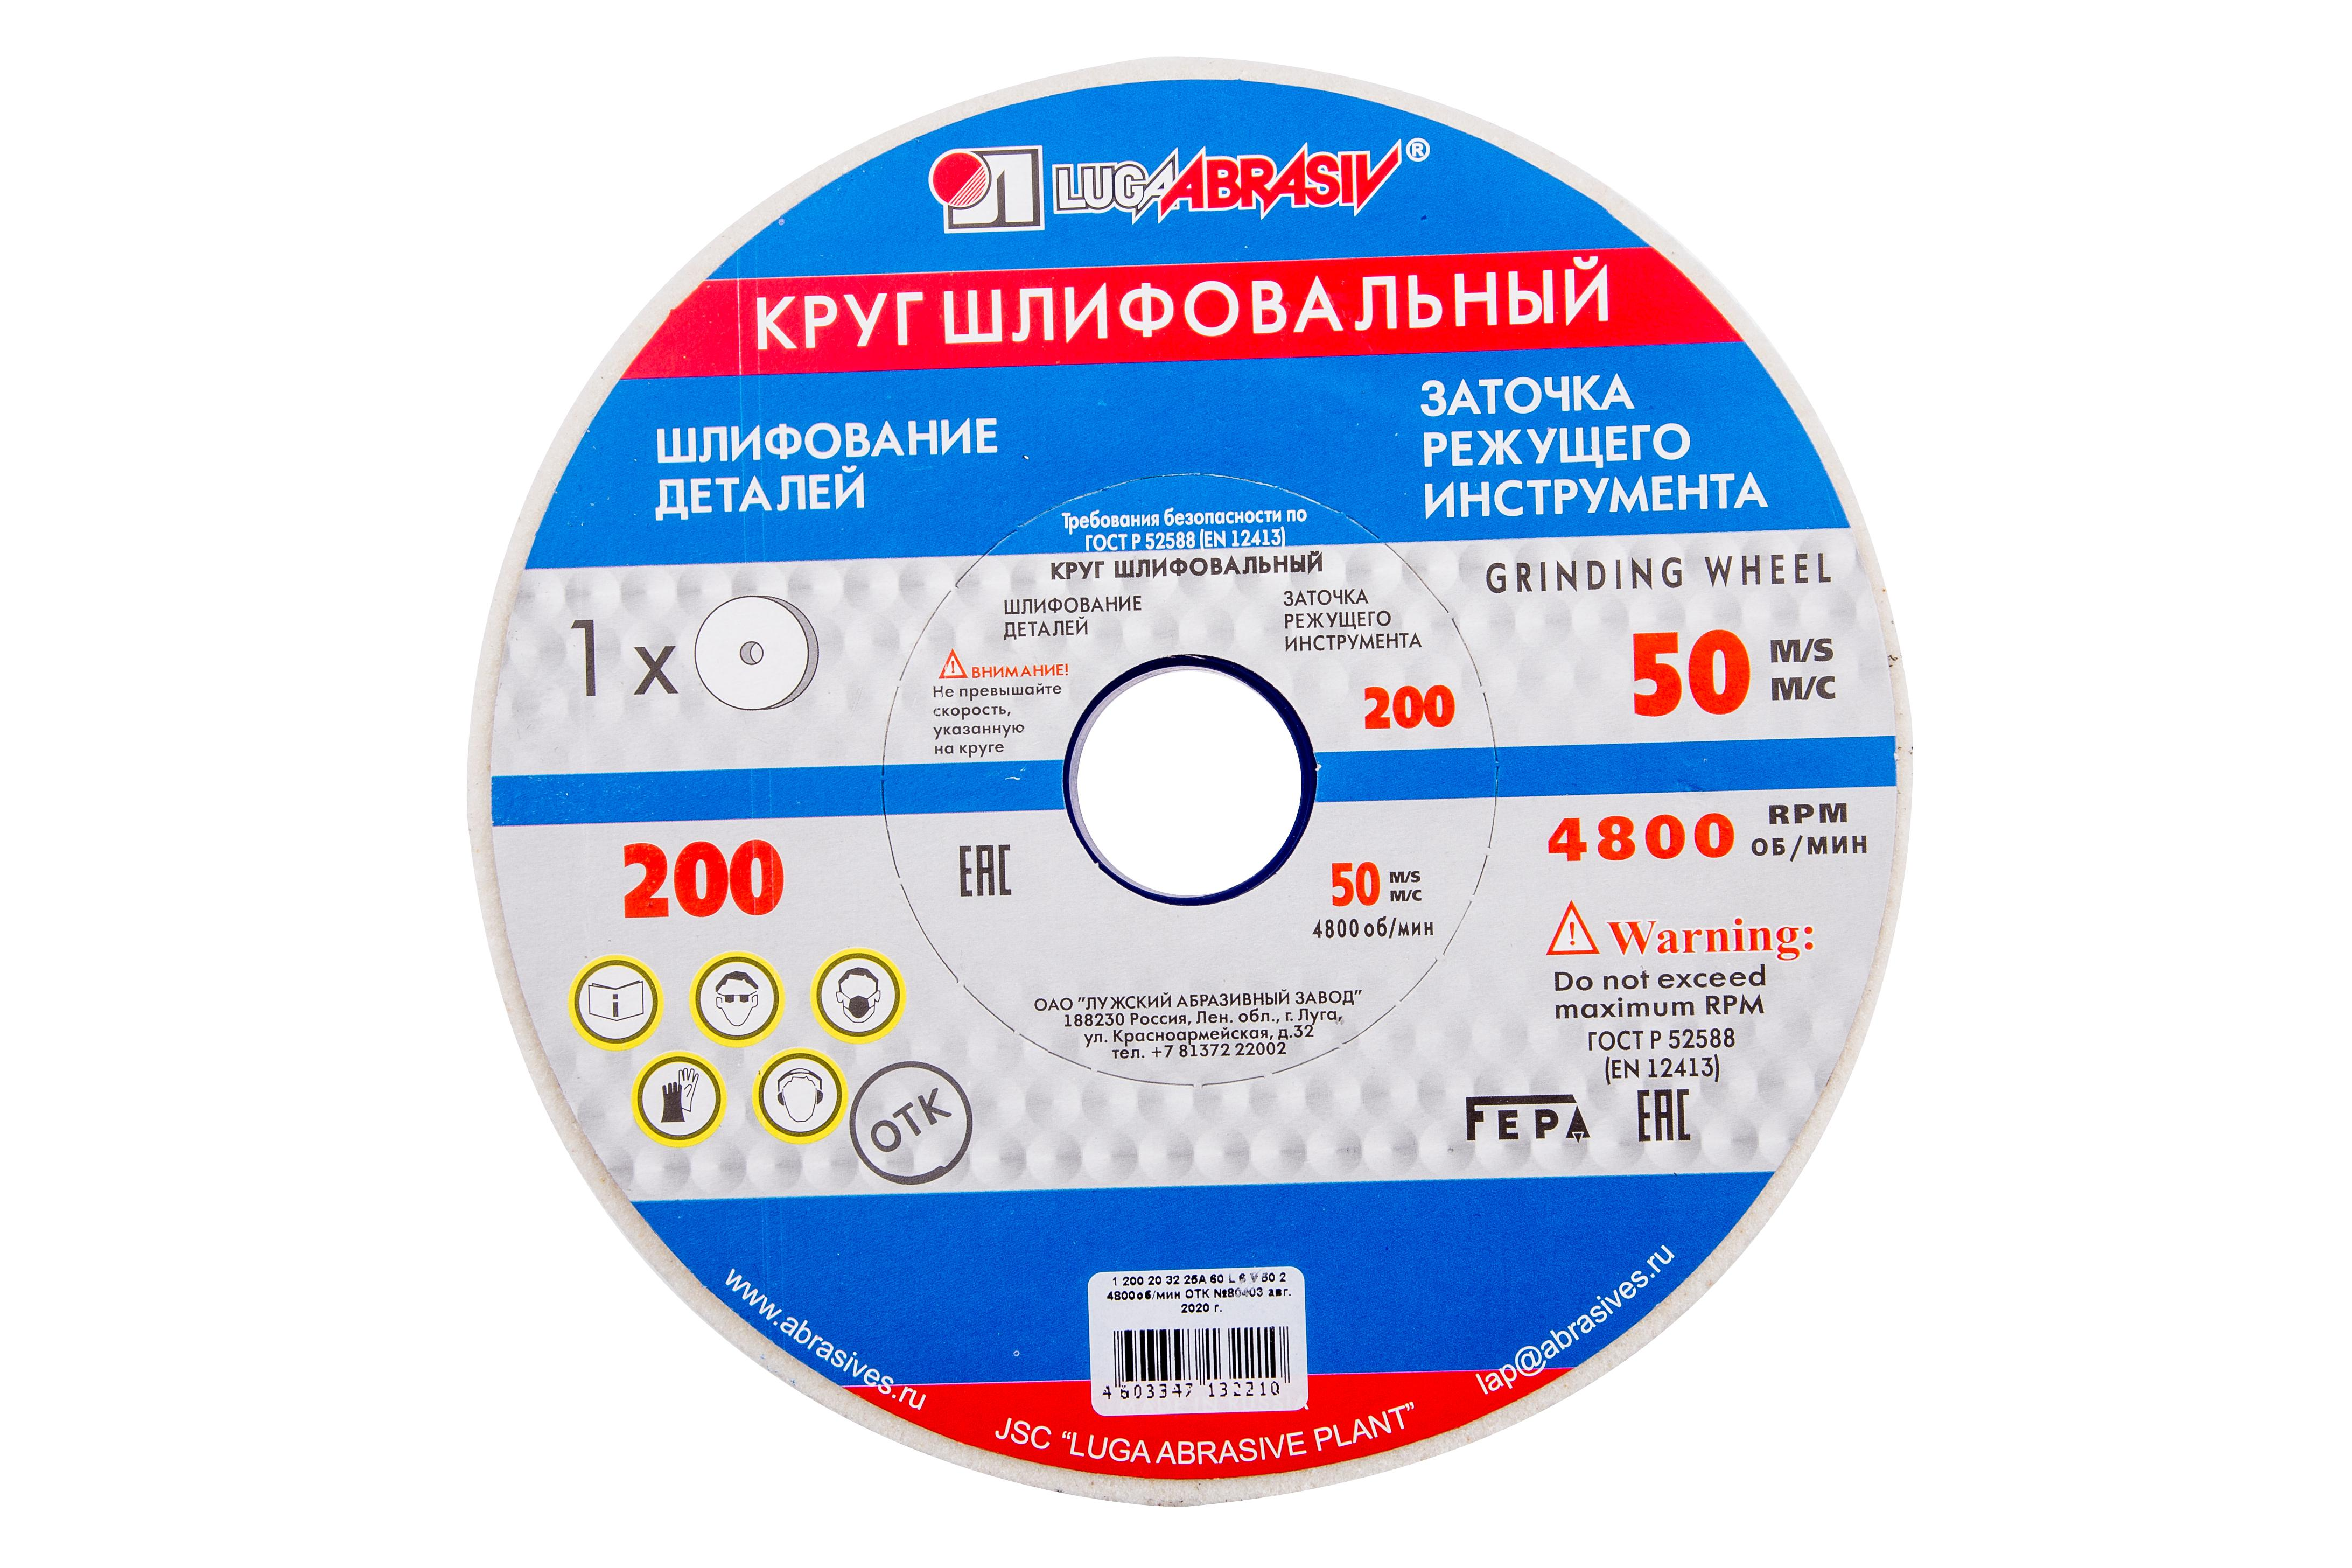 Круг шлифовальный ЛУГА-АБРАЗИВ 1 200 Х 20 Х 32 25А 60 k,l